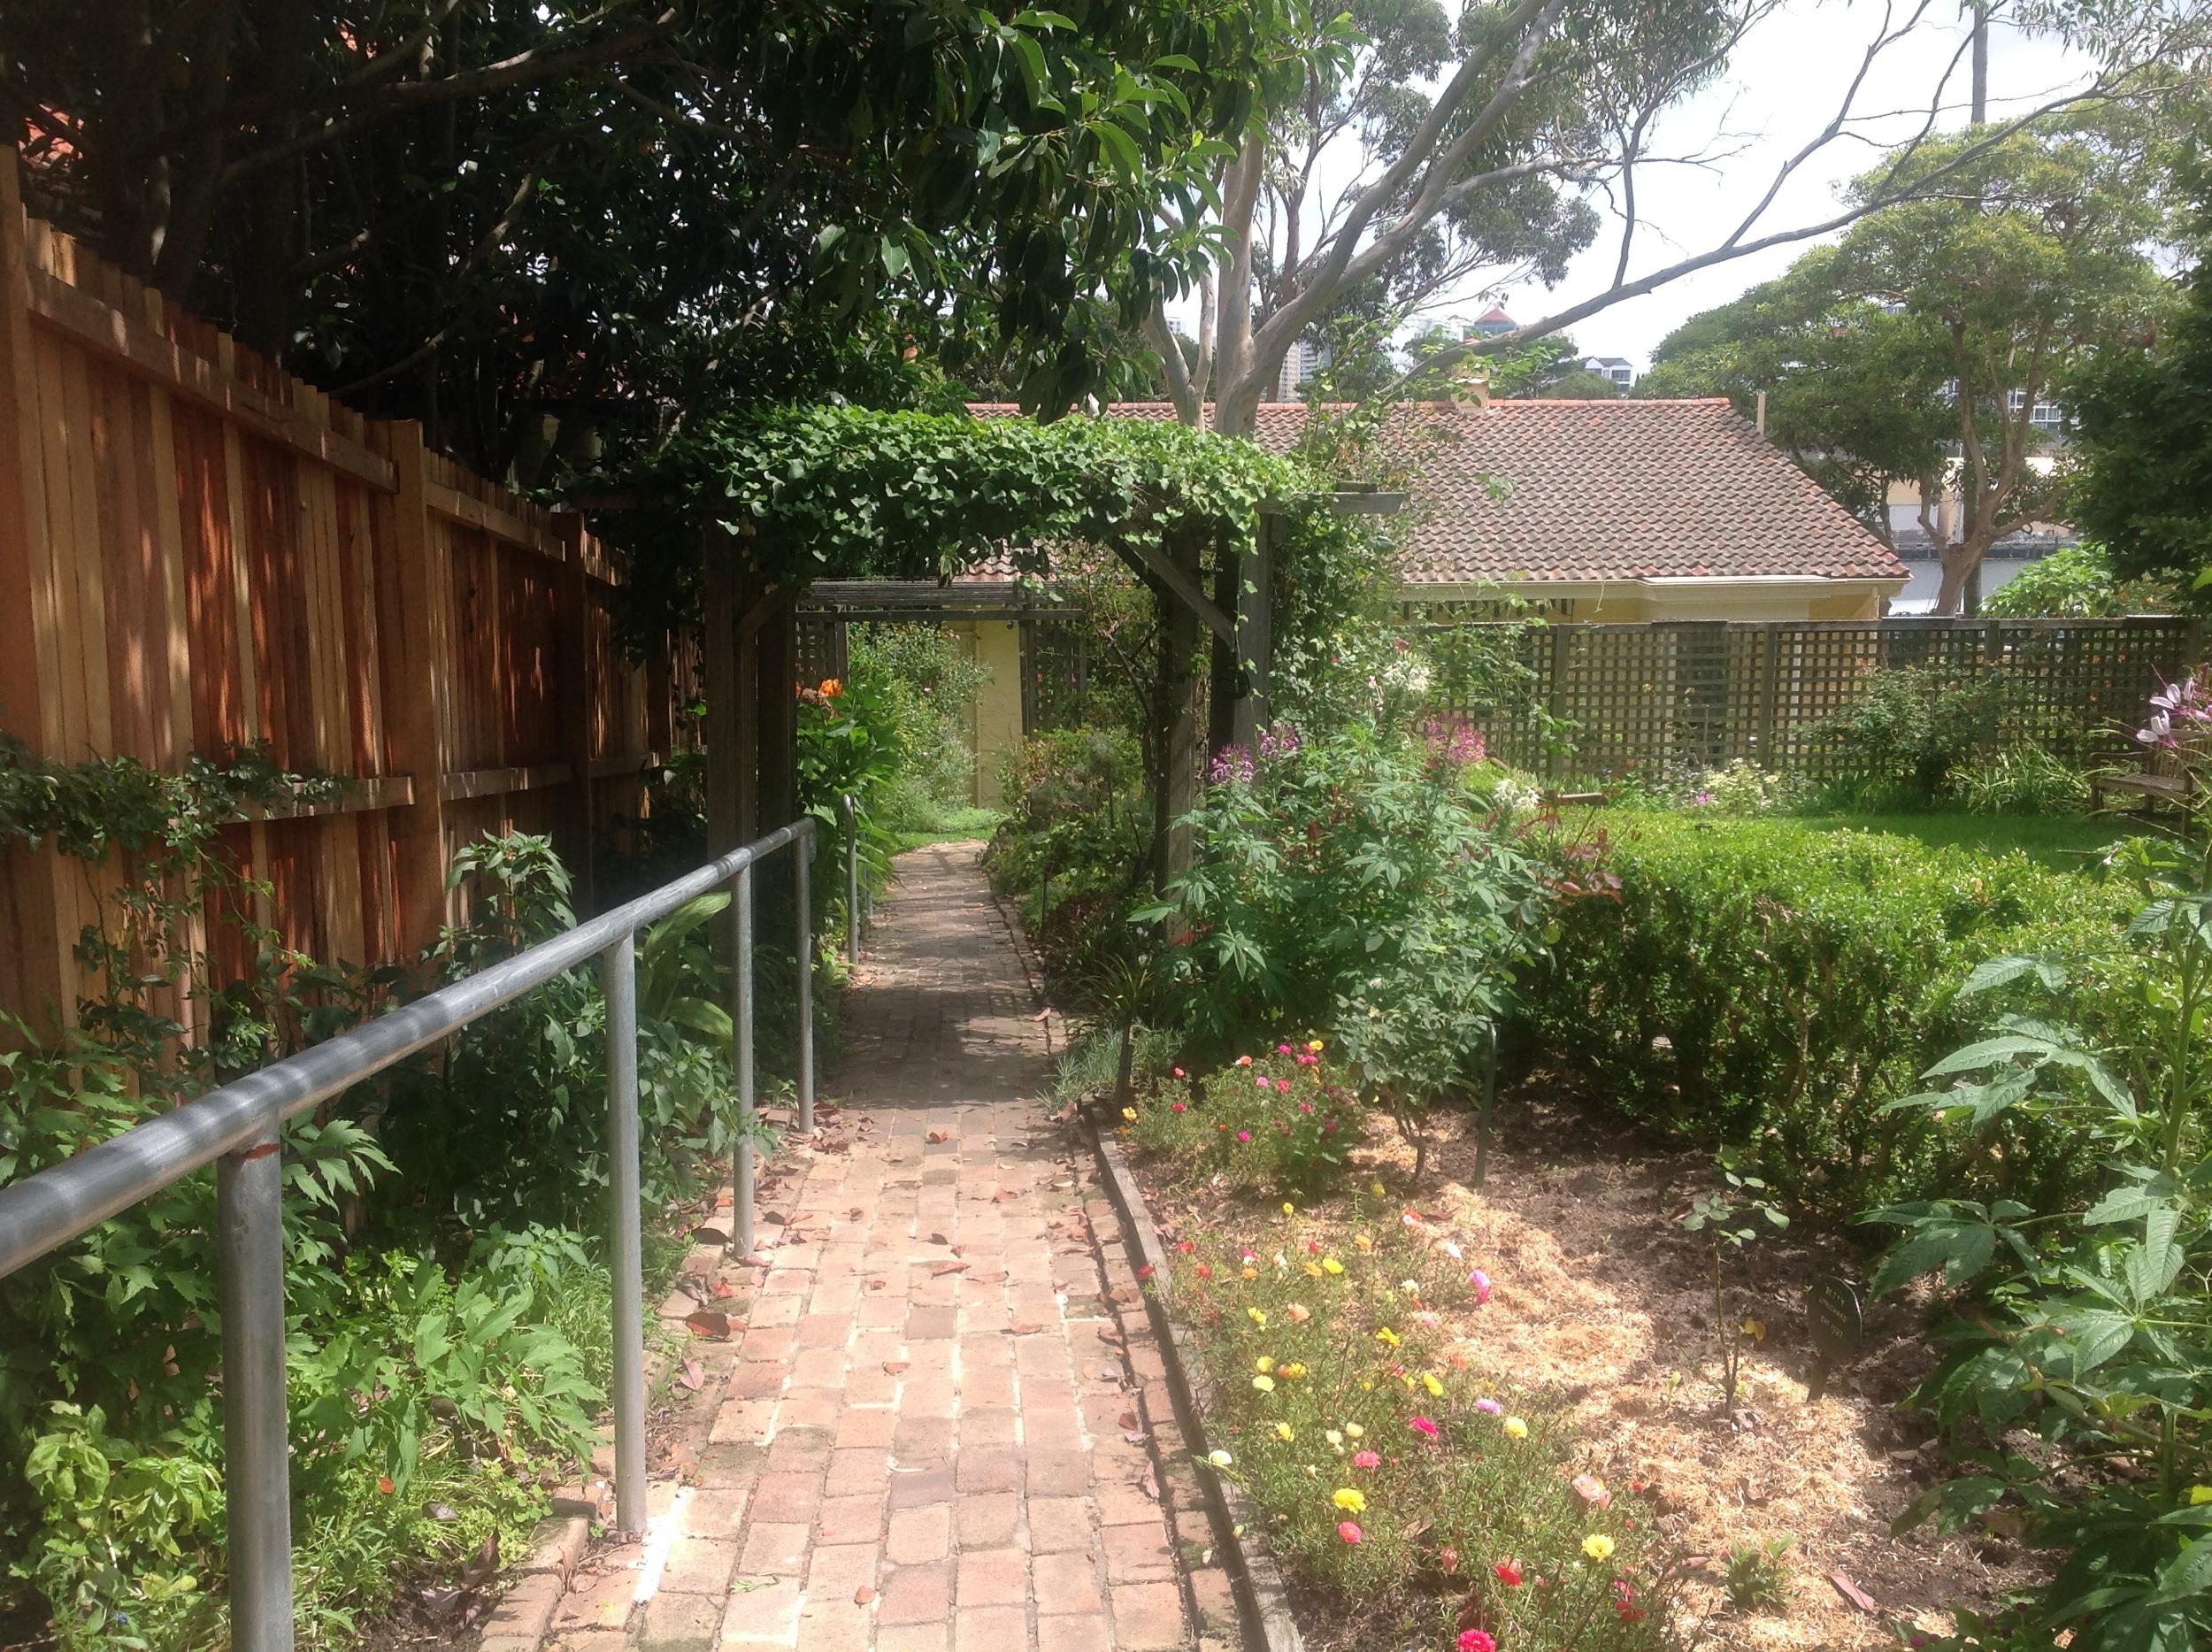 Imaginary gardens, Nutcote House, Neutral Bay,Sydney